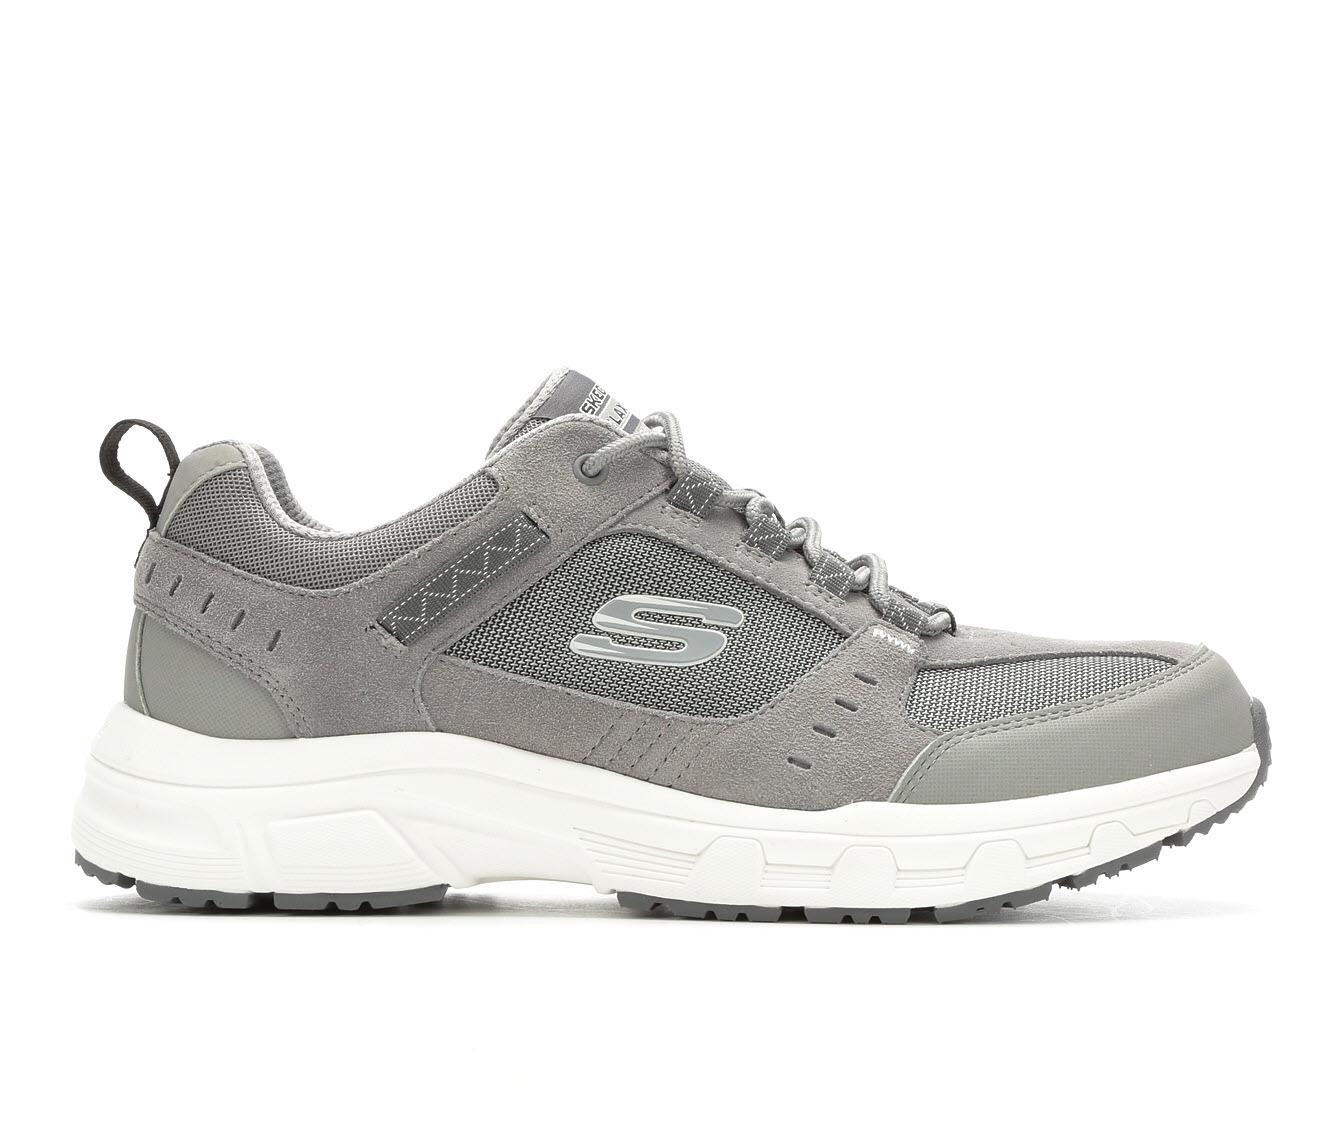 Skechers Oak Canyon 51893 Walking Shoes